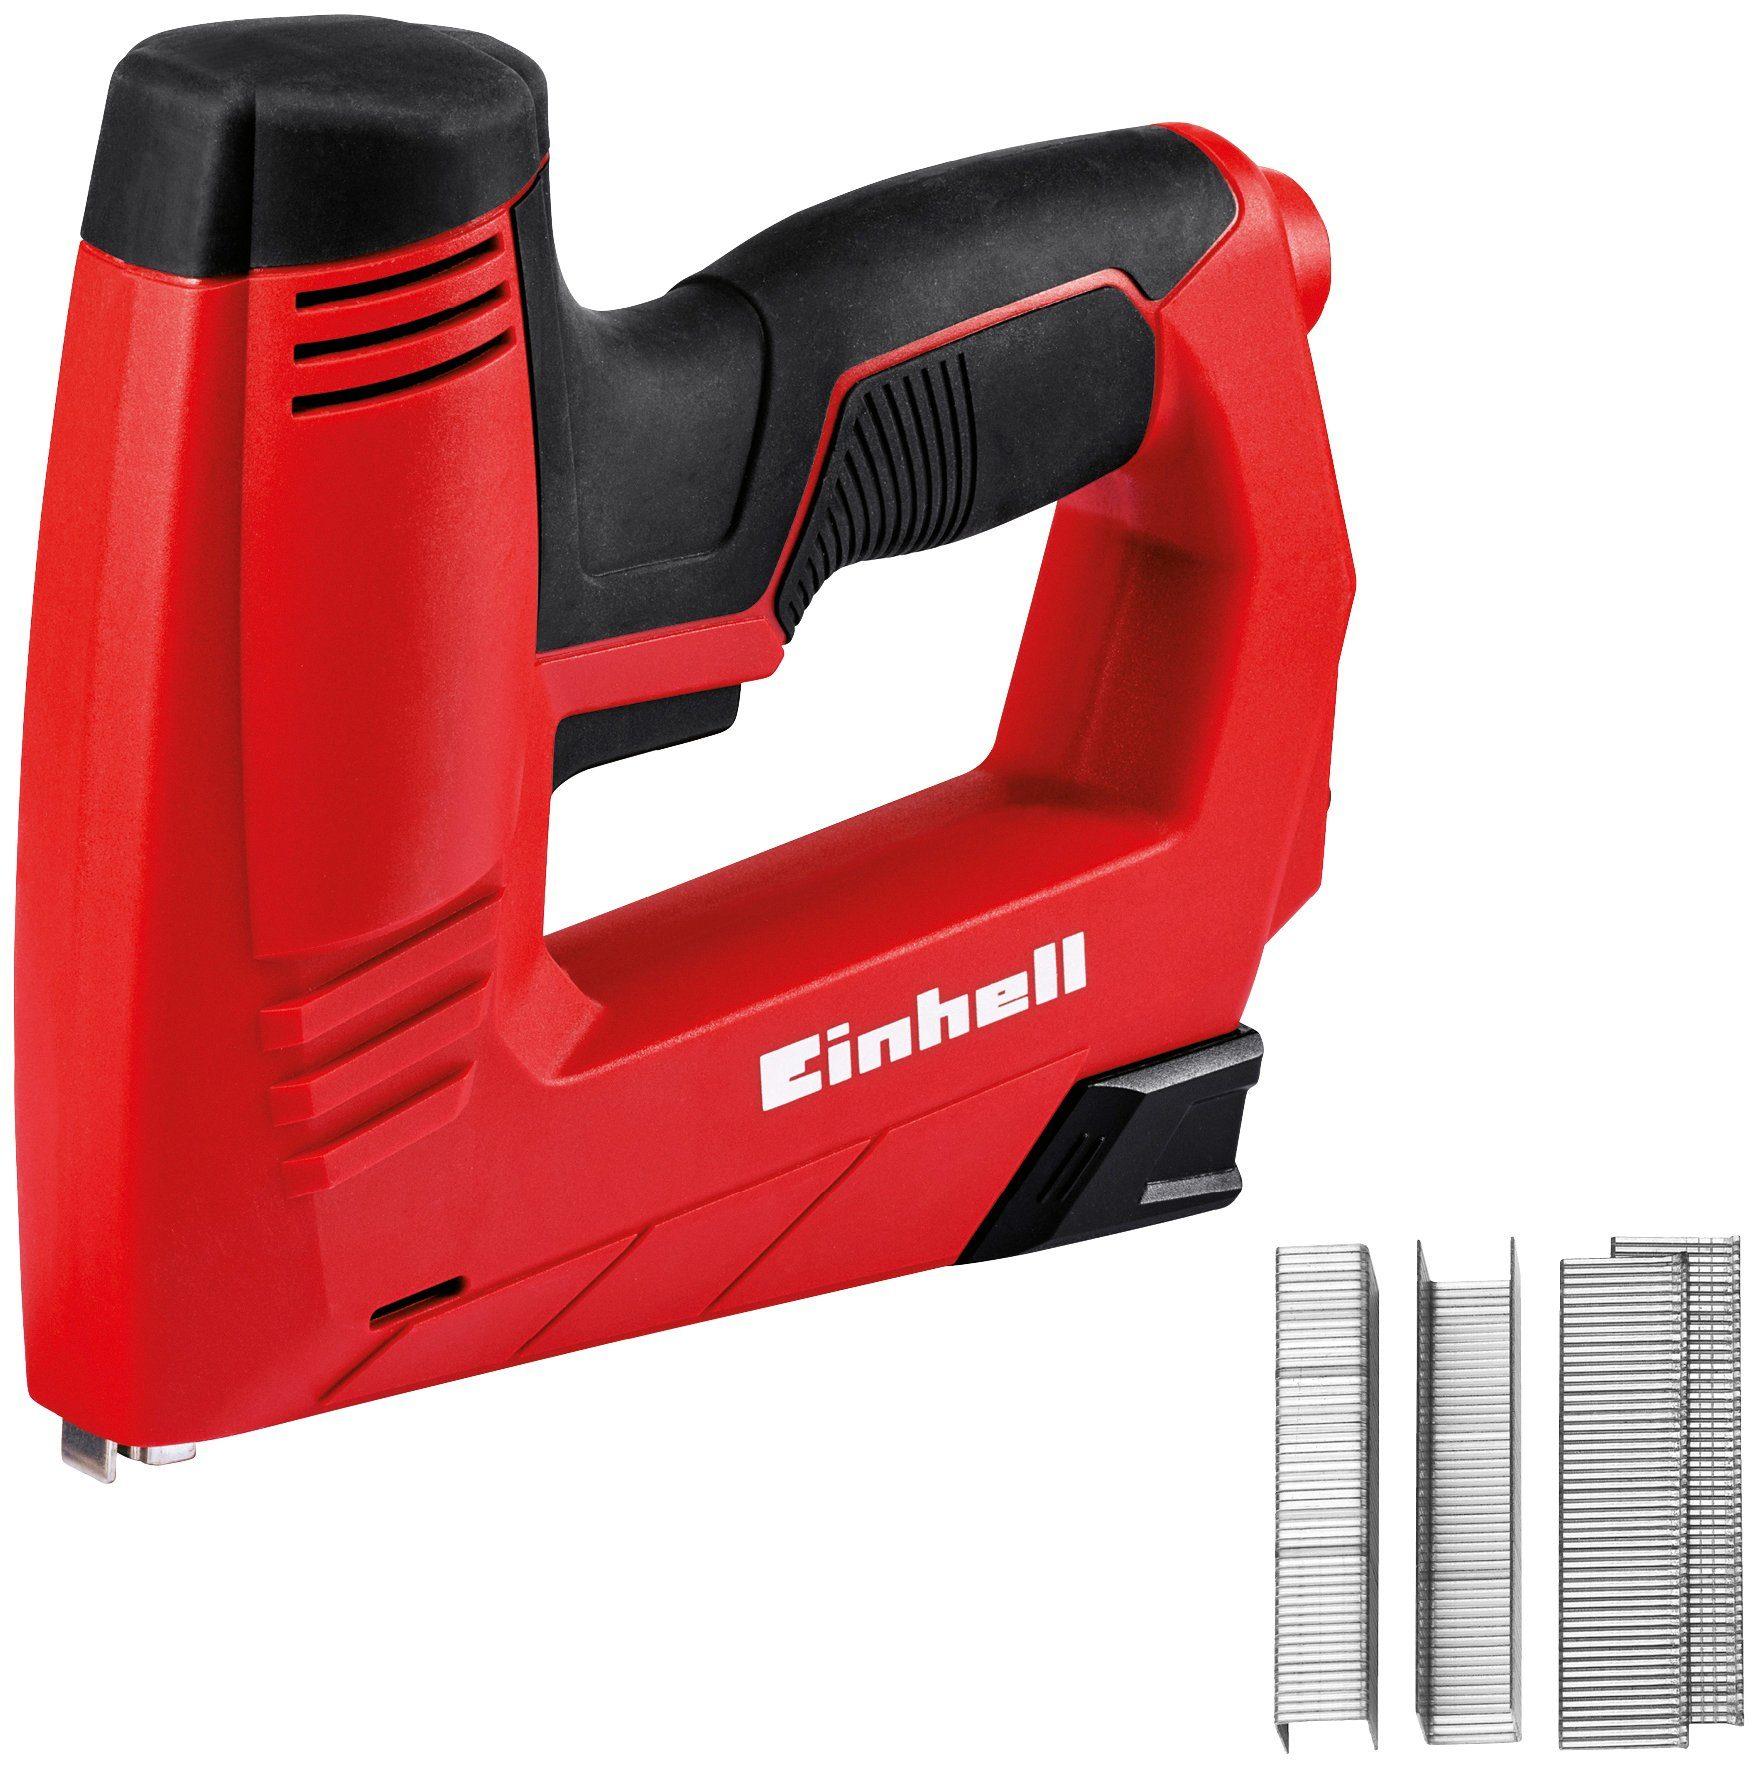 EINHELL Elektro-Tacker »TC-EN 20 E«, Inkl. 1000 Klammern und 500 Nägeln